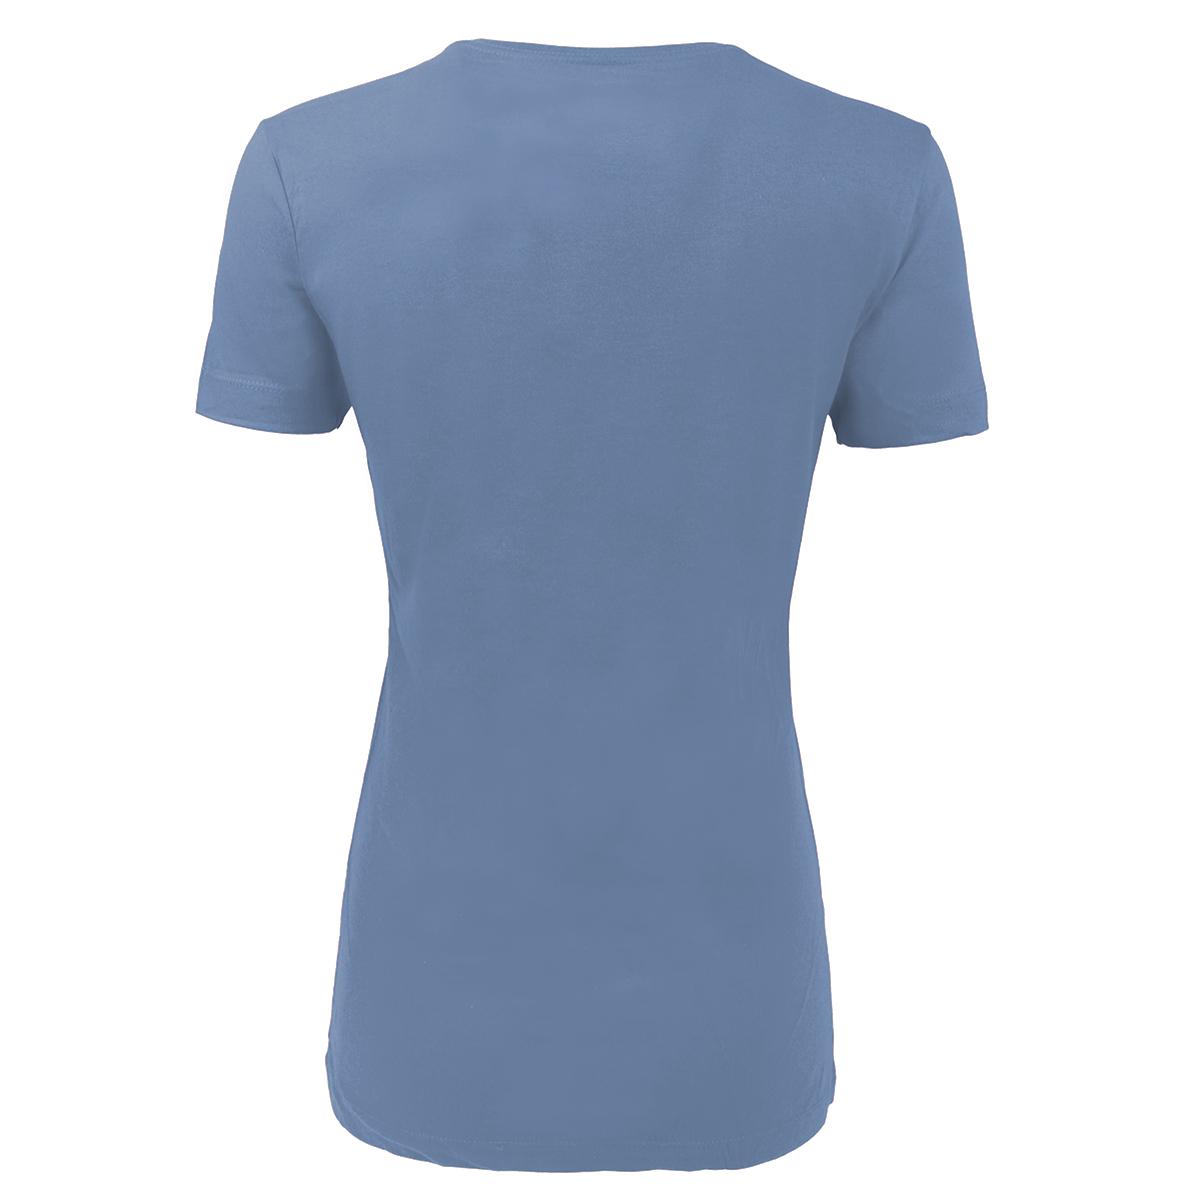 Nike-Women-039-s-Cotton-Slim-Fit-T-Shirt thumbnail 9